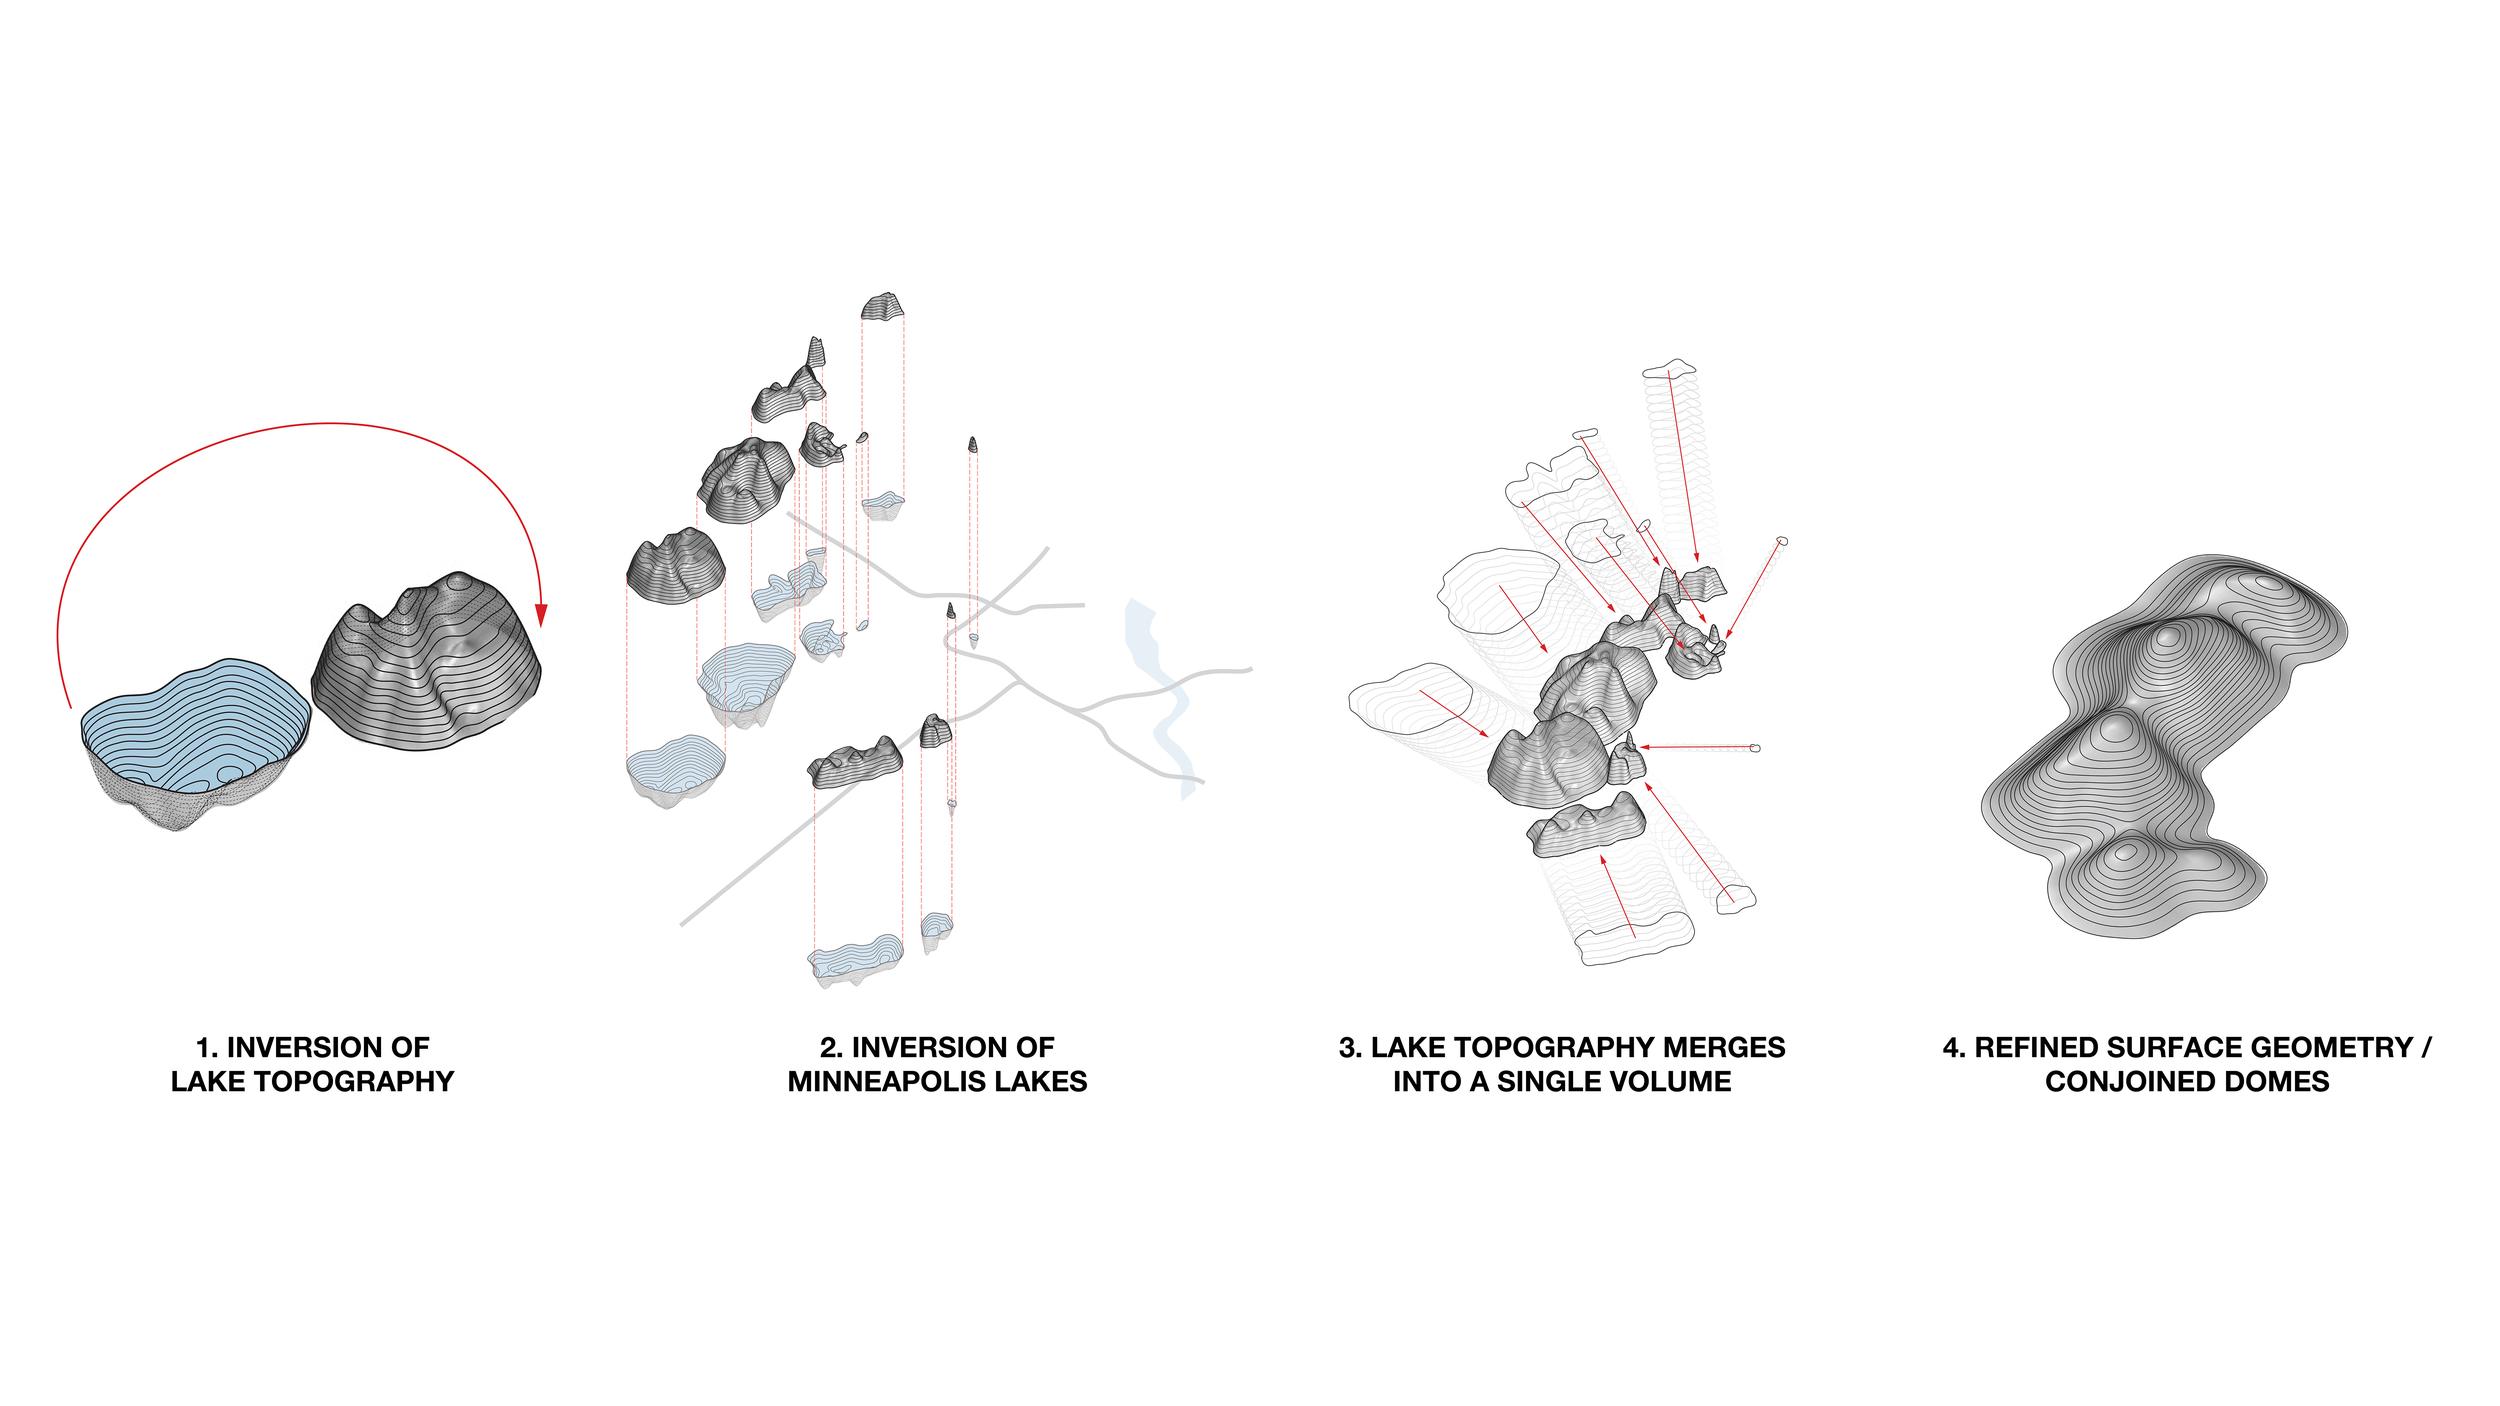 Evolutionary / Conceptual Diagrams